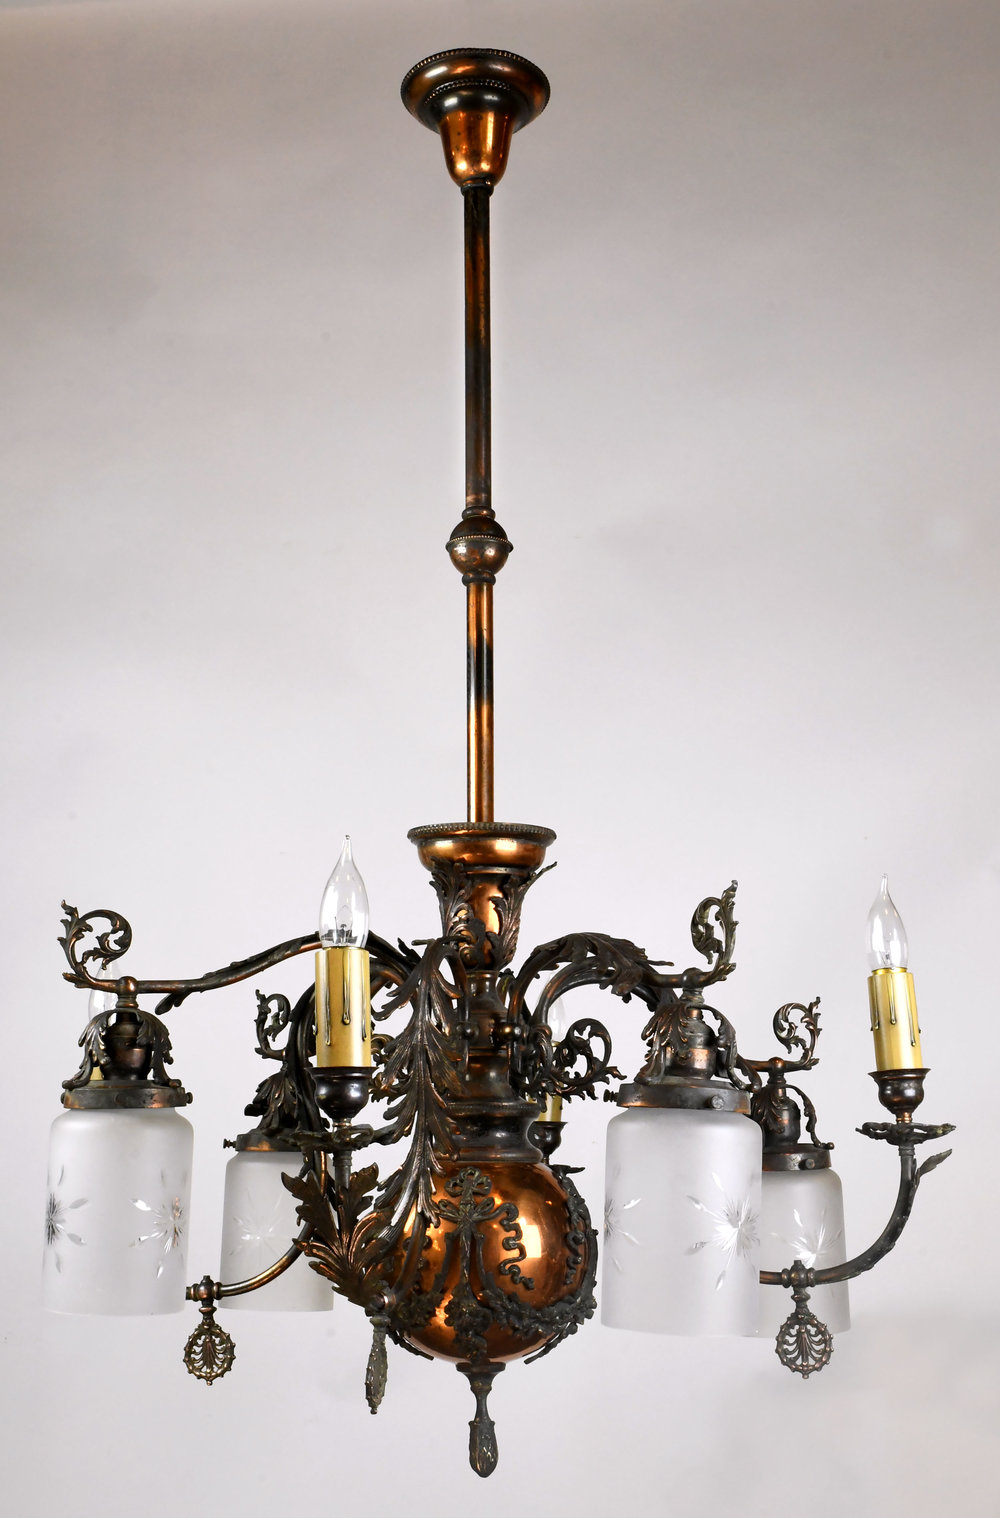 47471-gilt-satin-gas-electric-chandelier-full-view.jpg